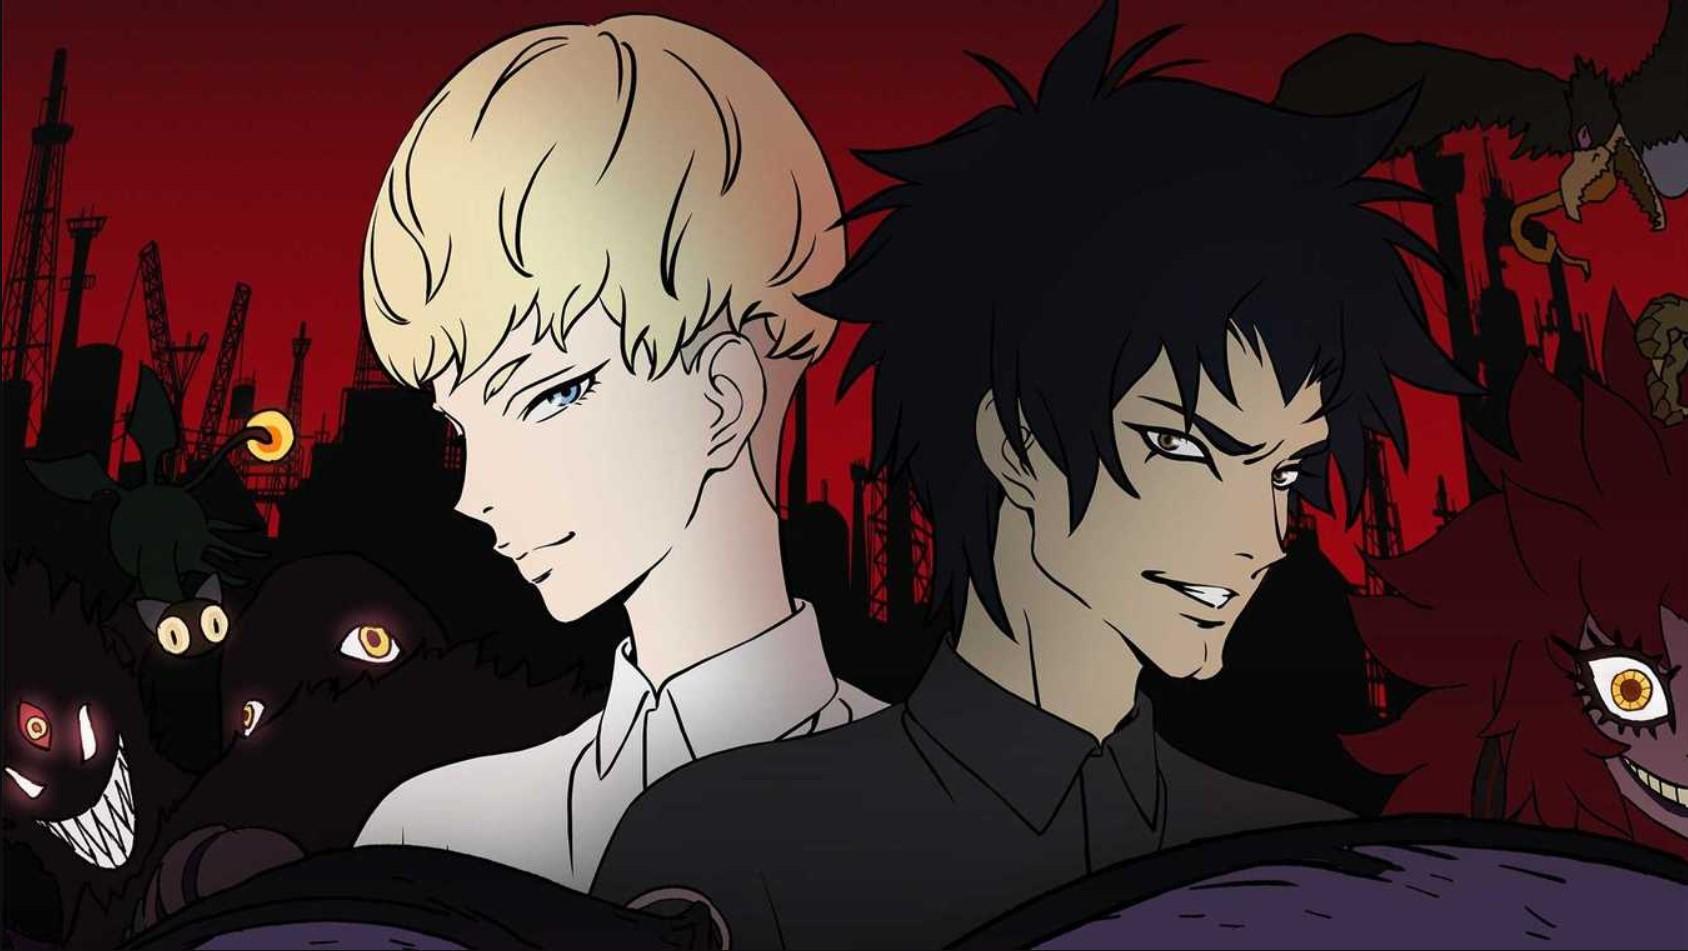 Devilman: Crybaby- anime like Tokyo ghoul